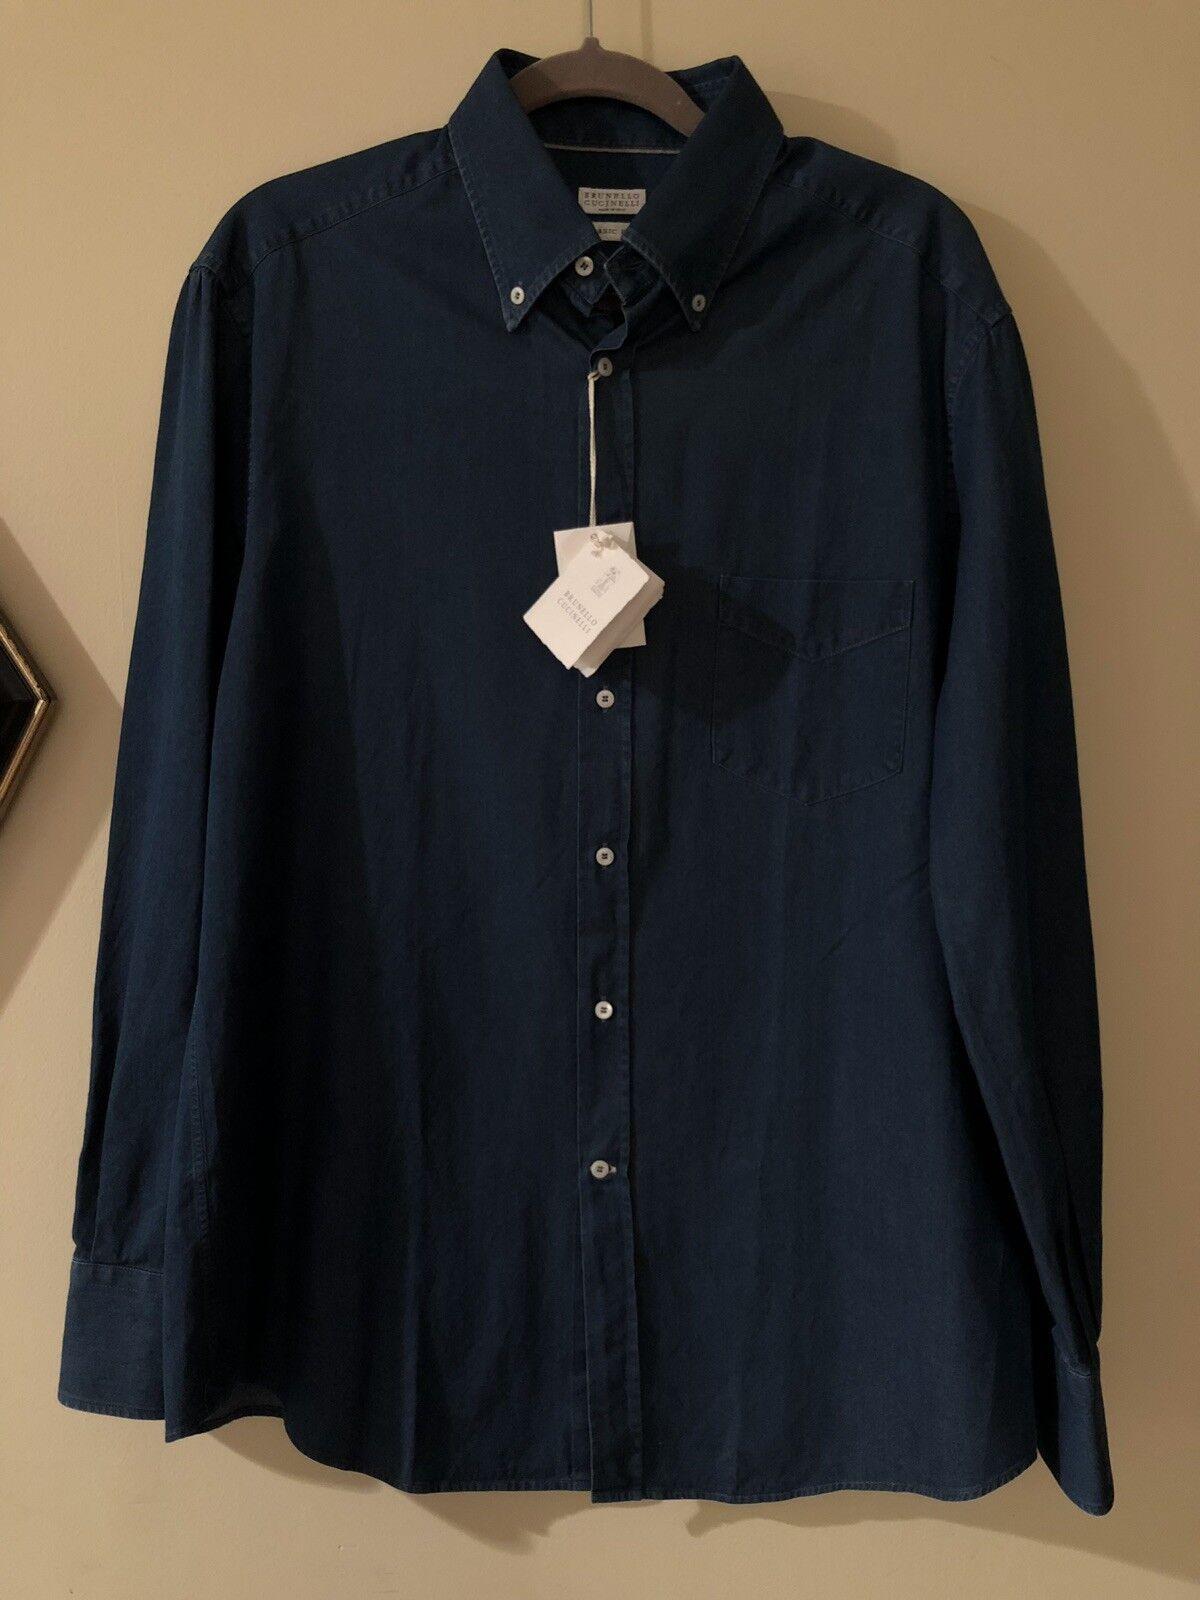 Brunello Cucinelli Denim Shirt,Large NWT